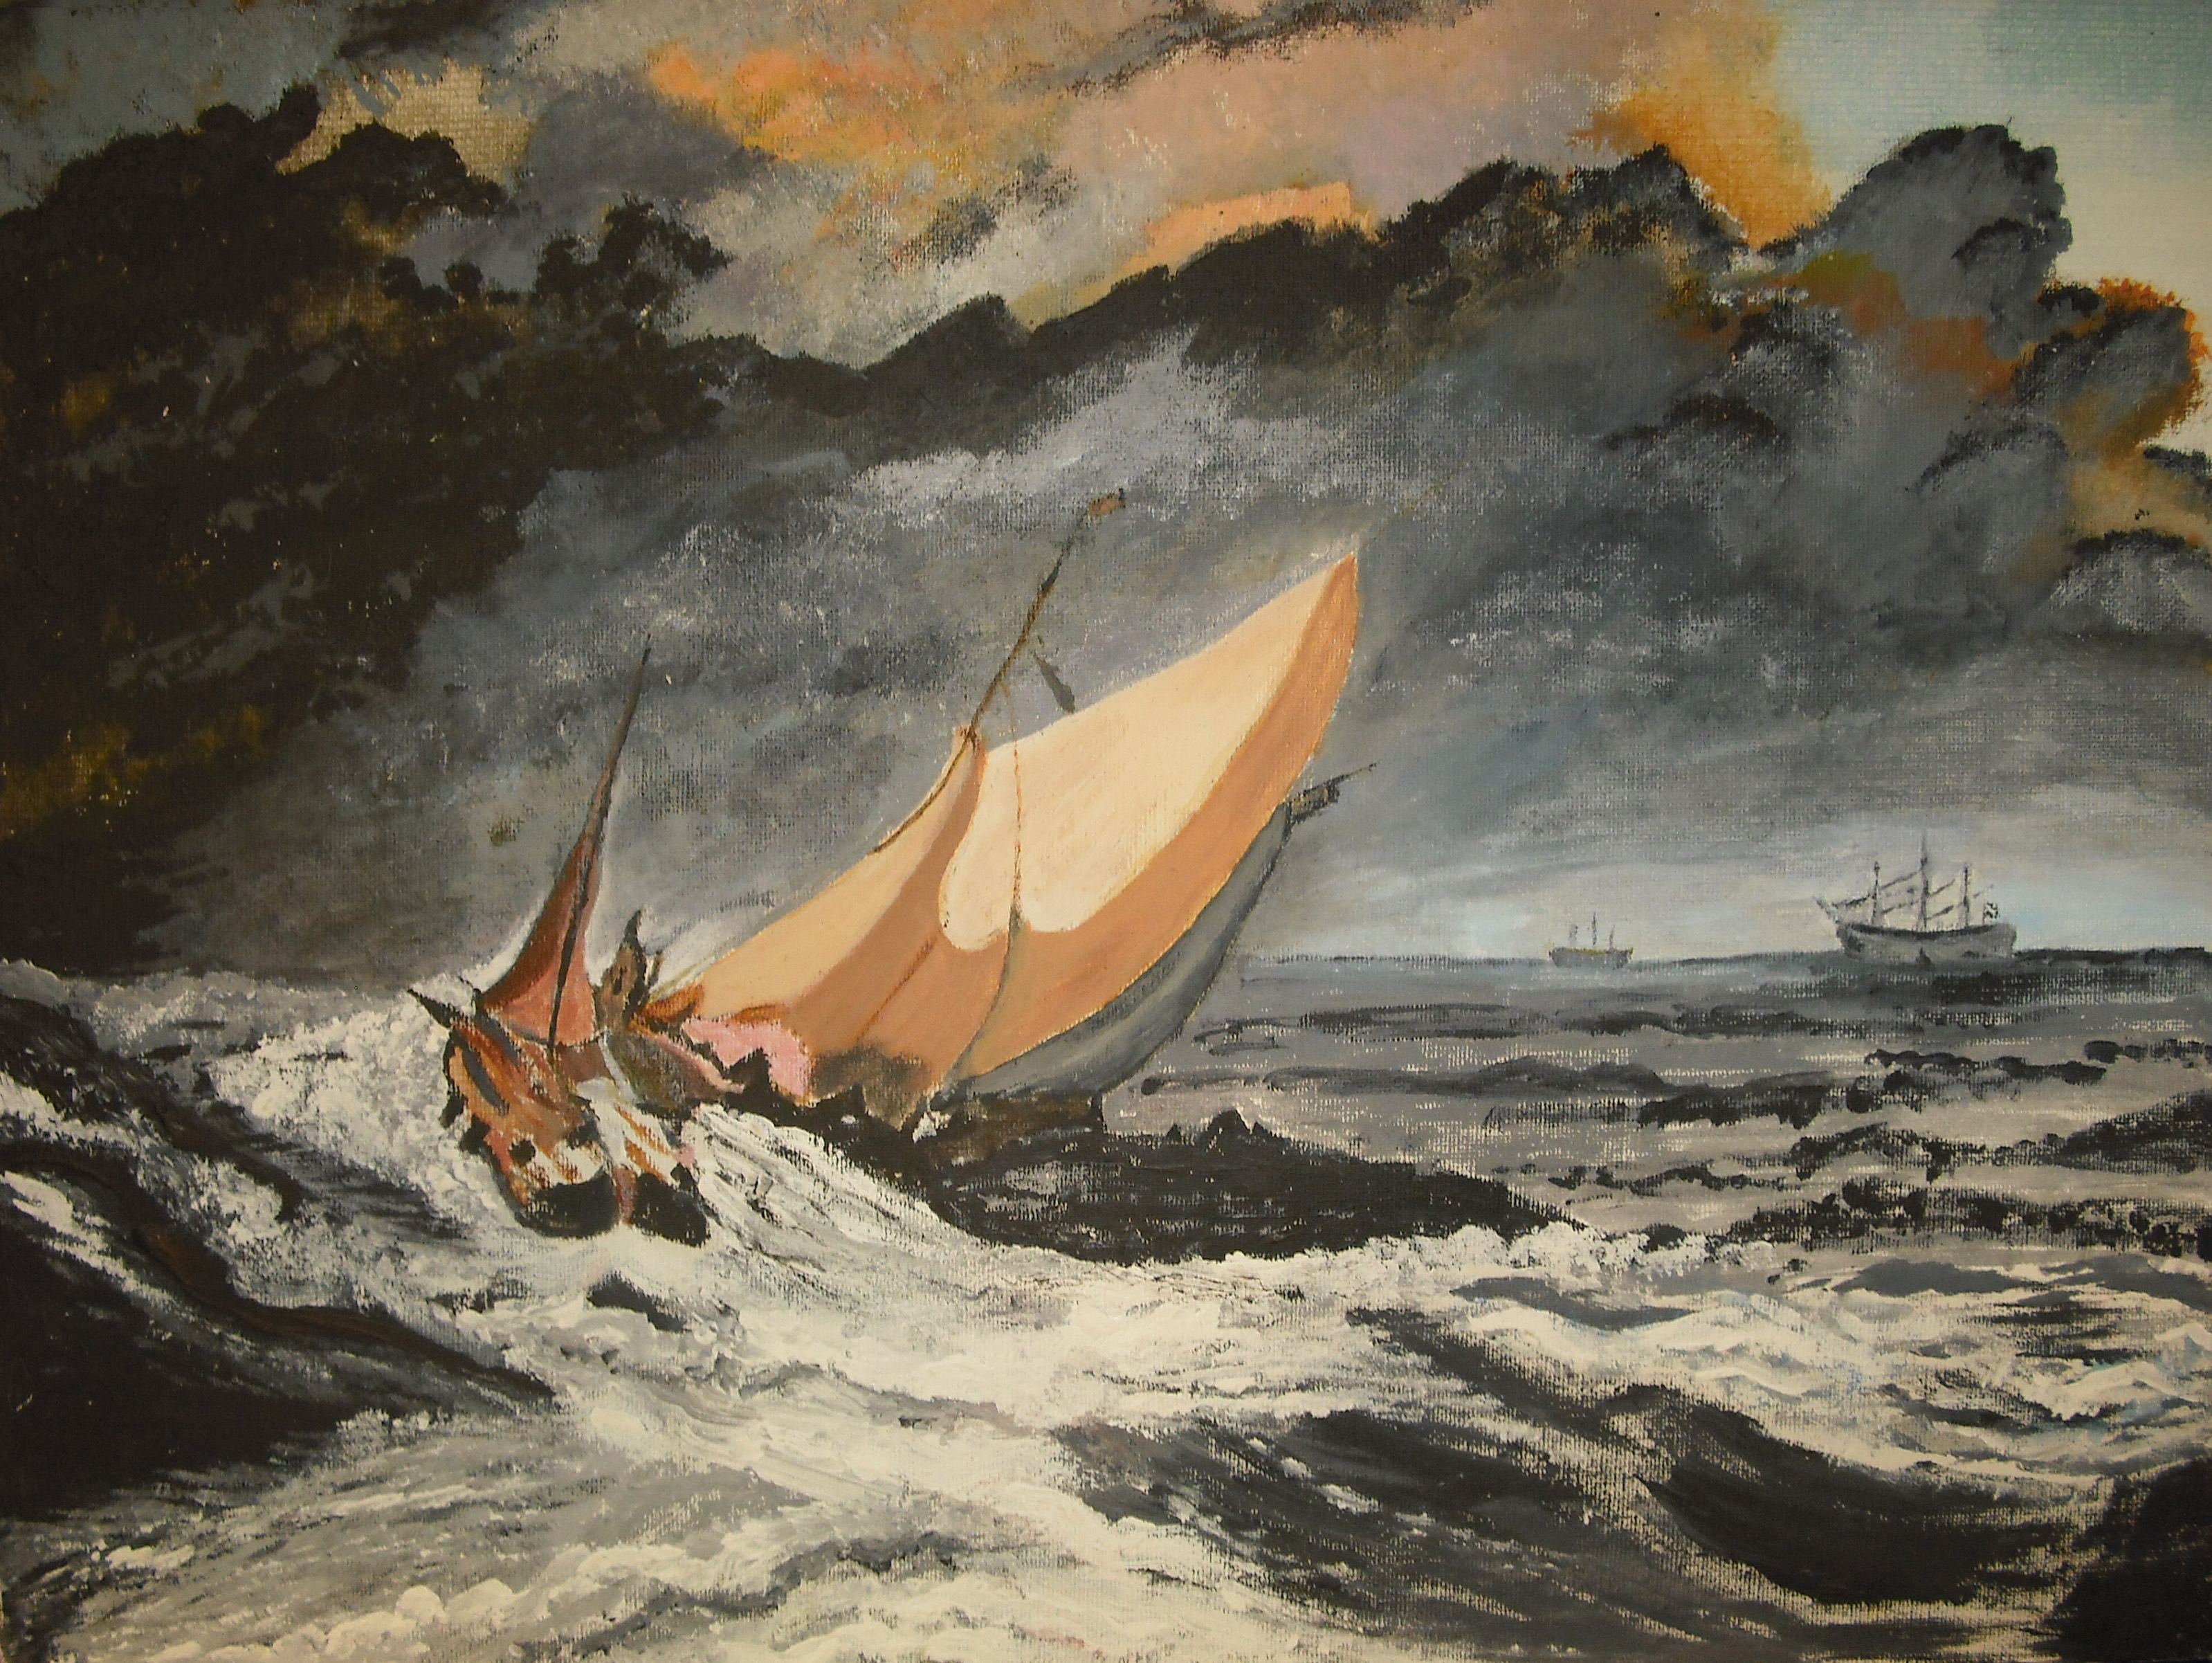 8971 || 2439 || Stormy sea